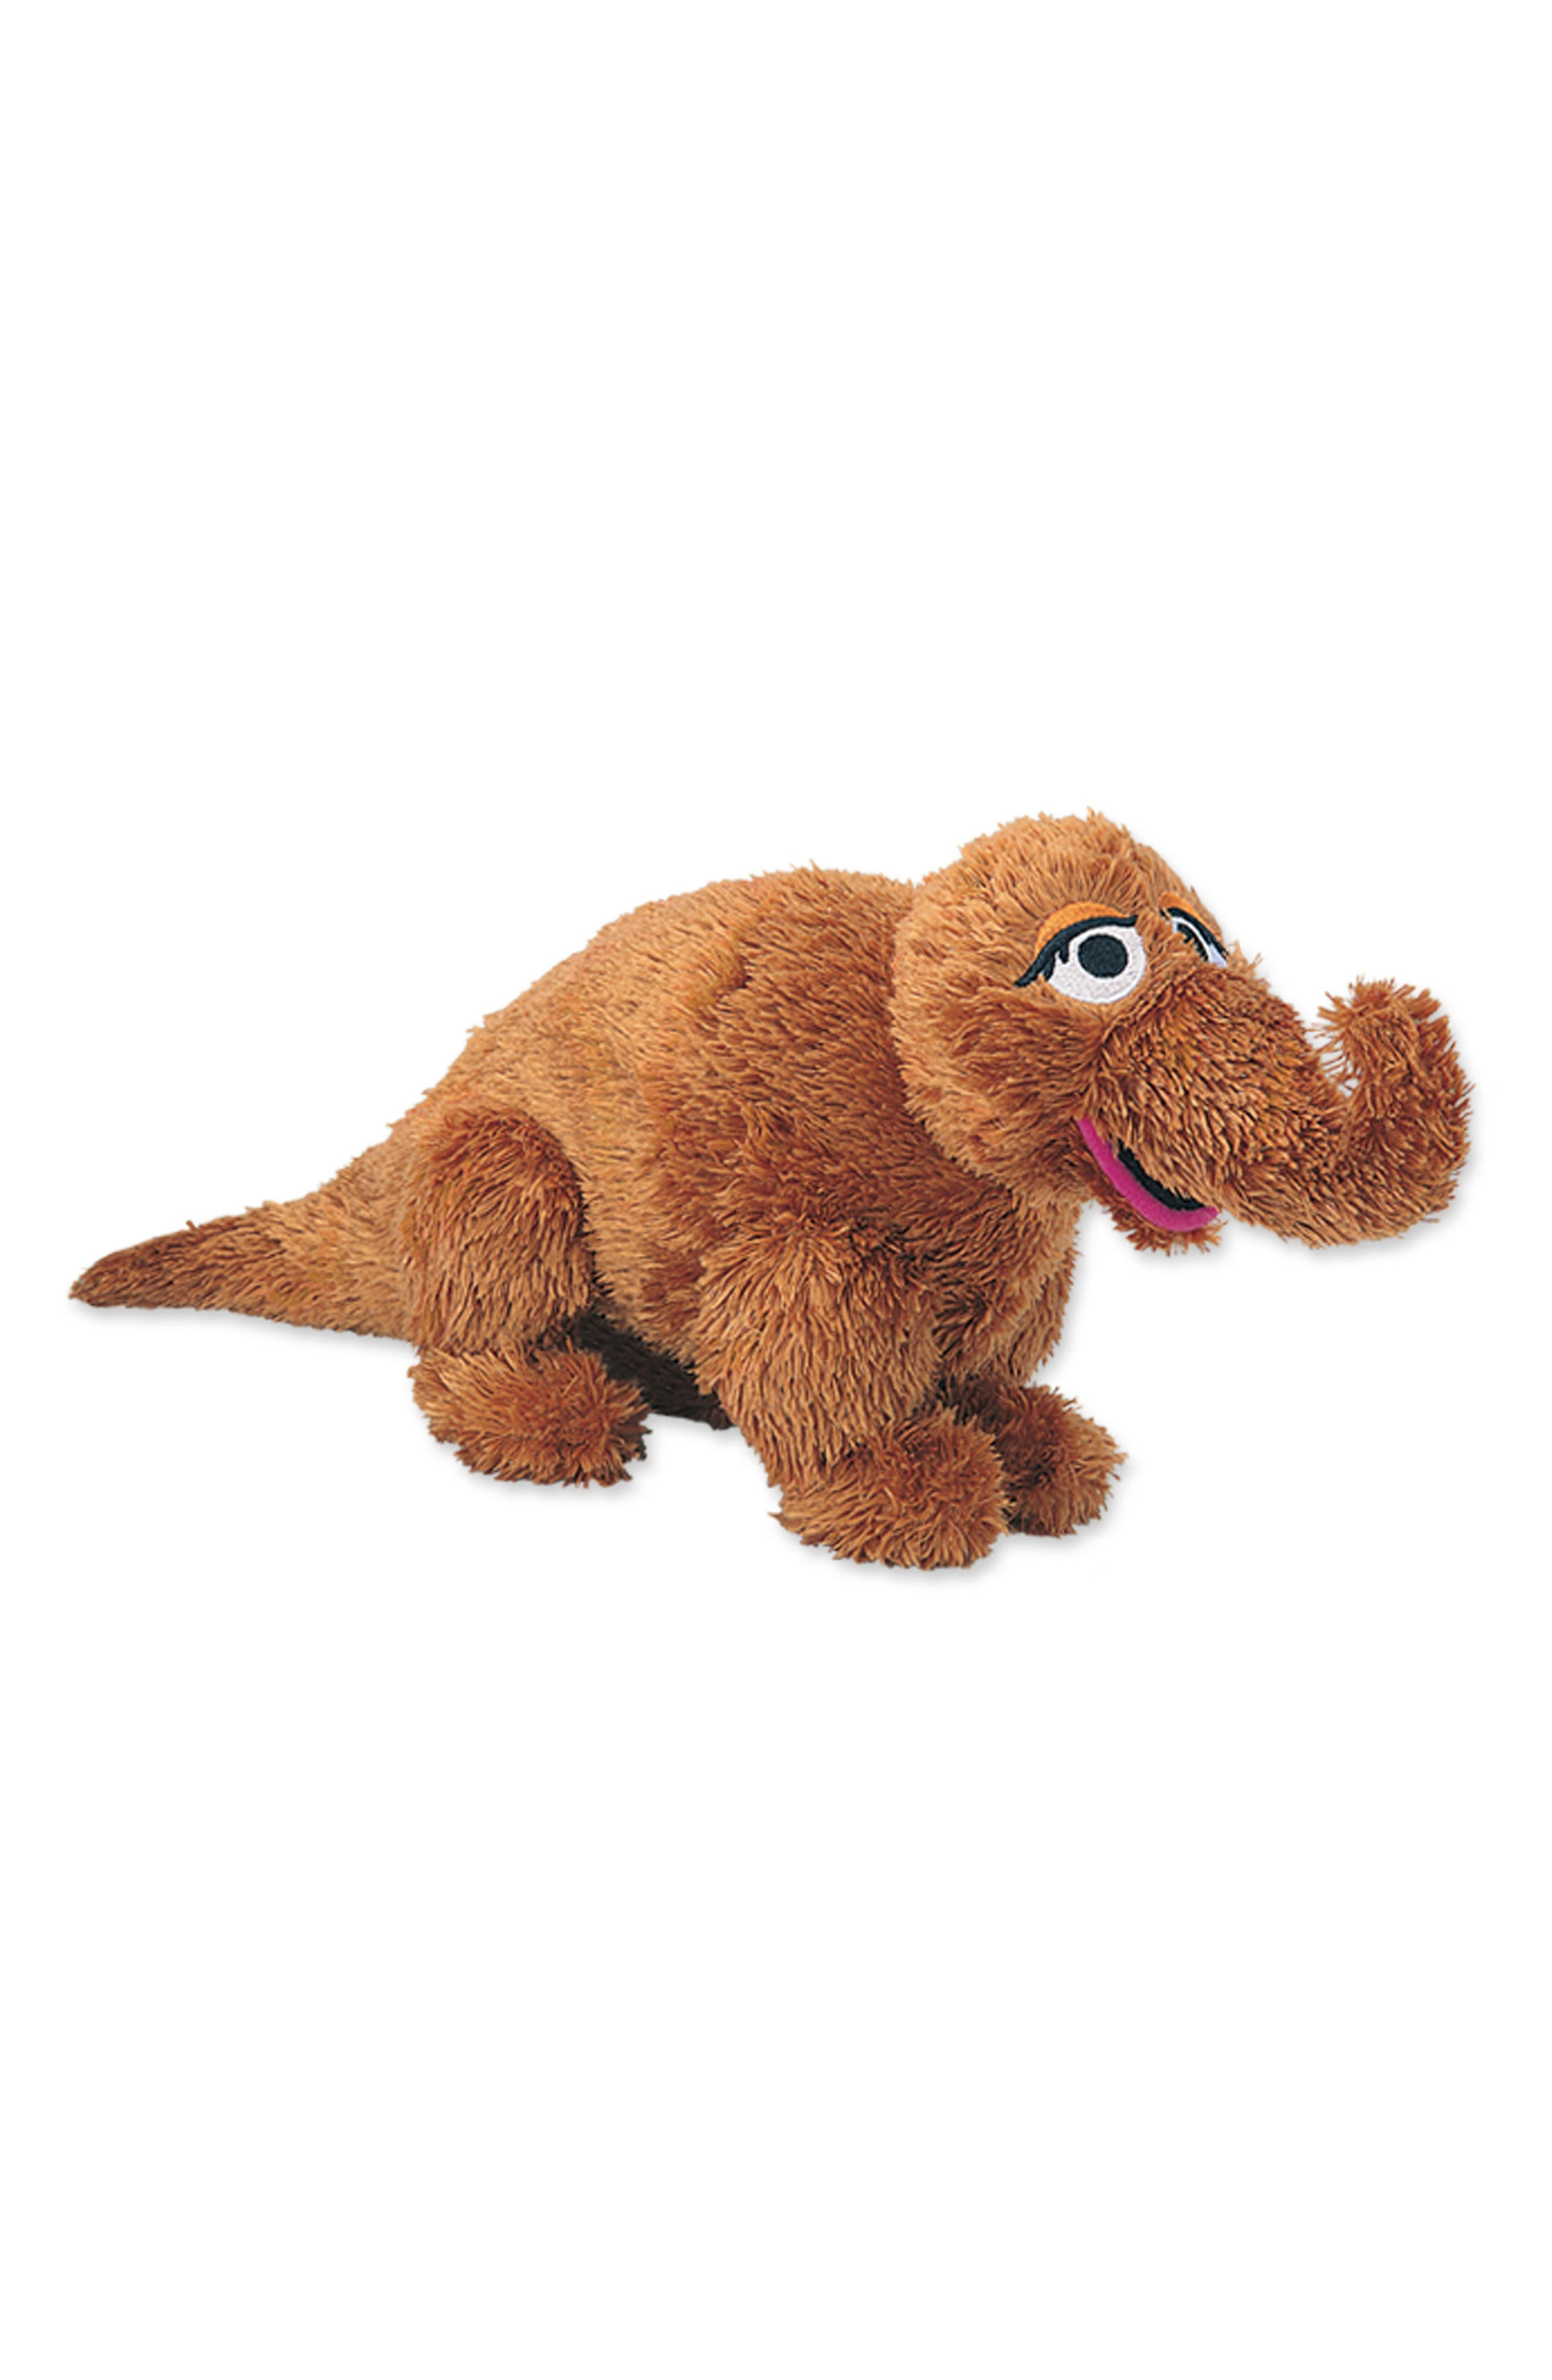 'Snuffleupagus' Stuffed Toy,                             Main thumbnail 1, color,                             Brown